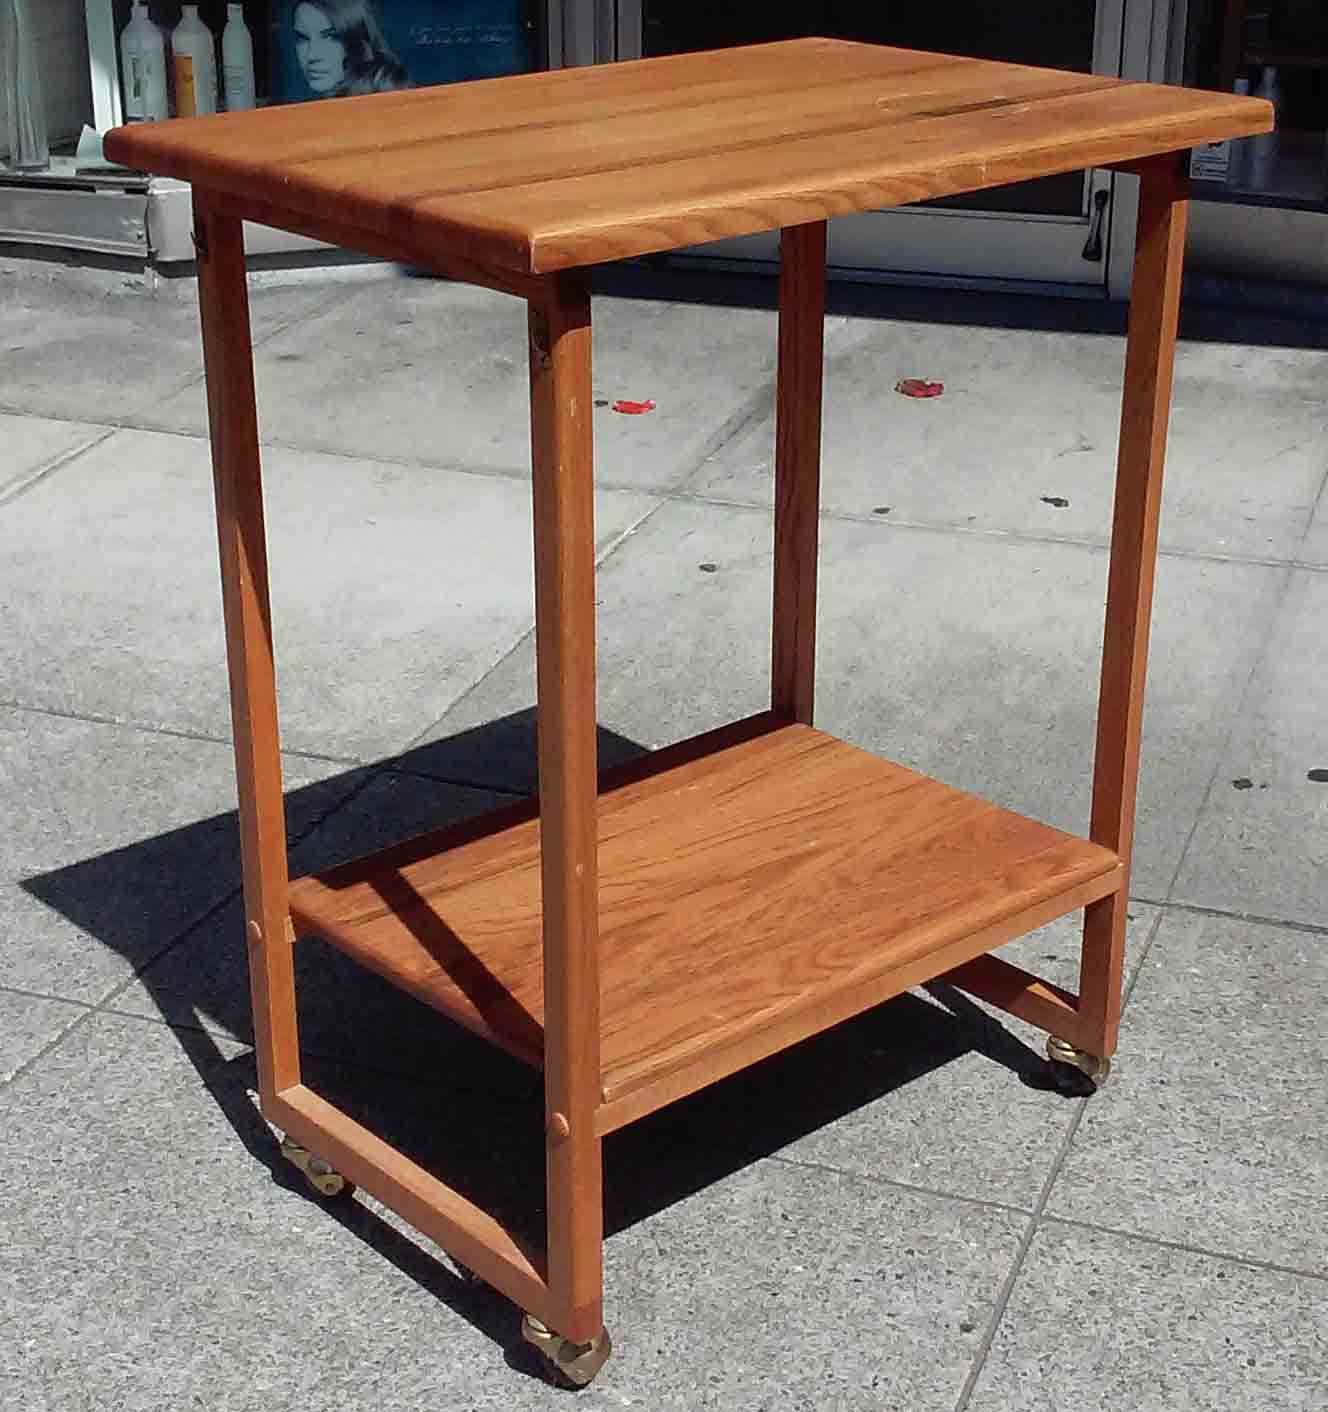 UHURU FURNITURE & COLLECTIBLES: SOLD Oak Butcher Block Kitchen Cart - $45